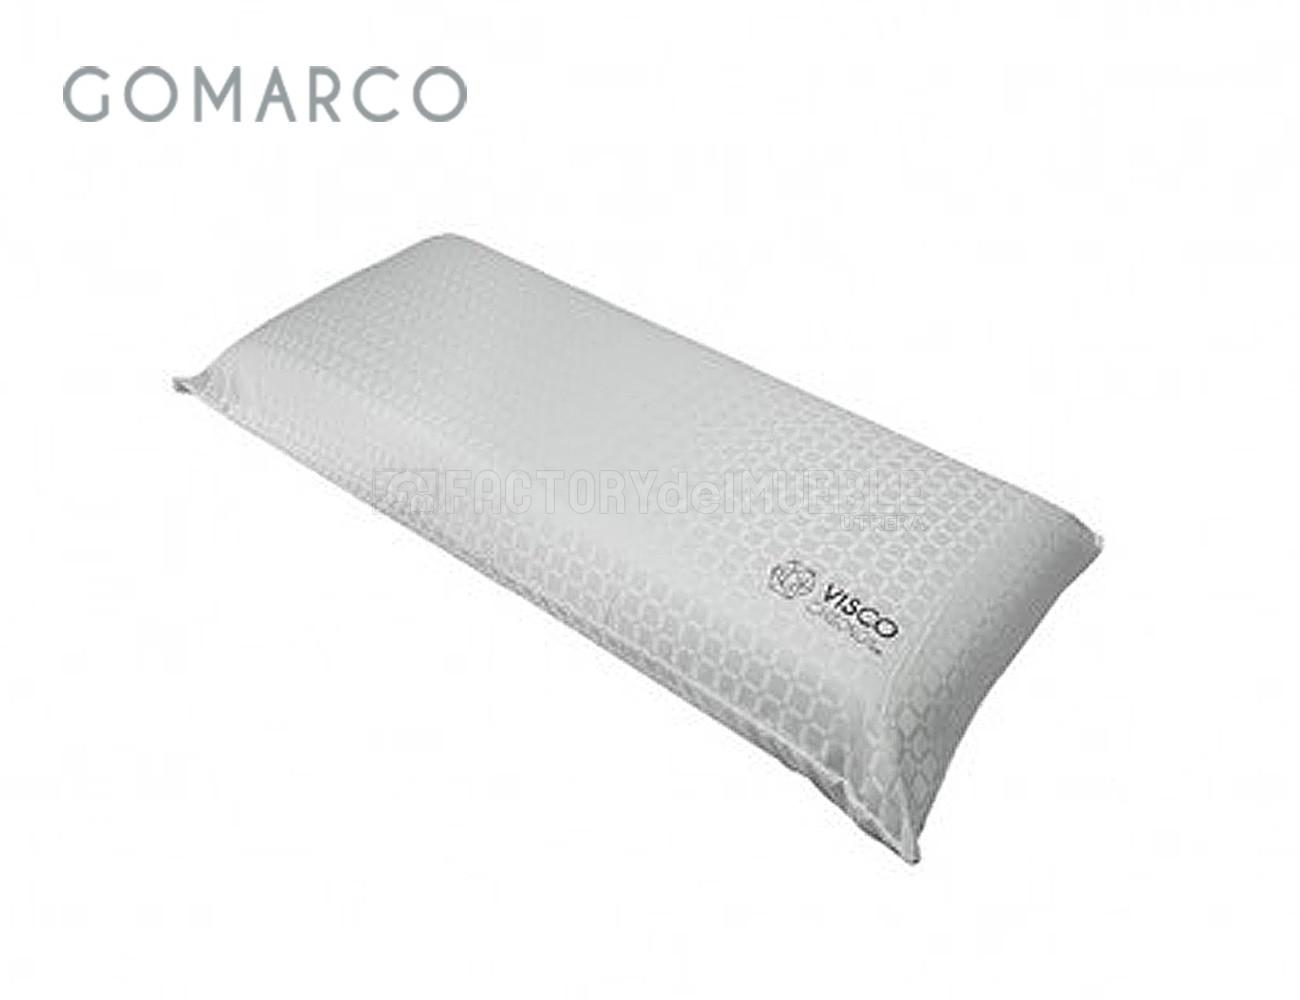 Almohada visco carbono gomarco 13001